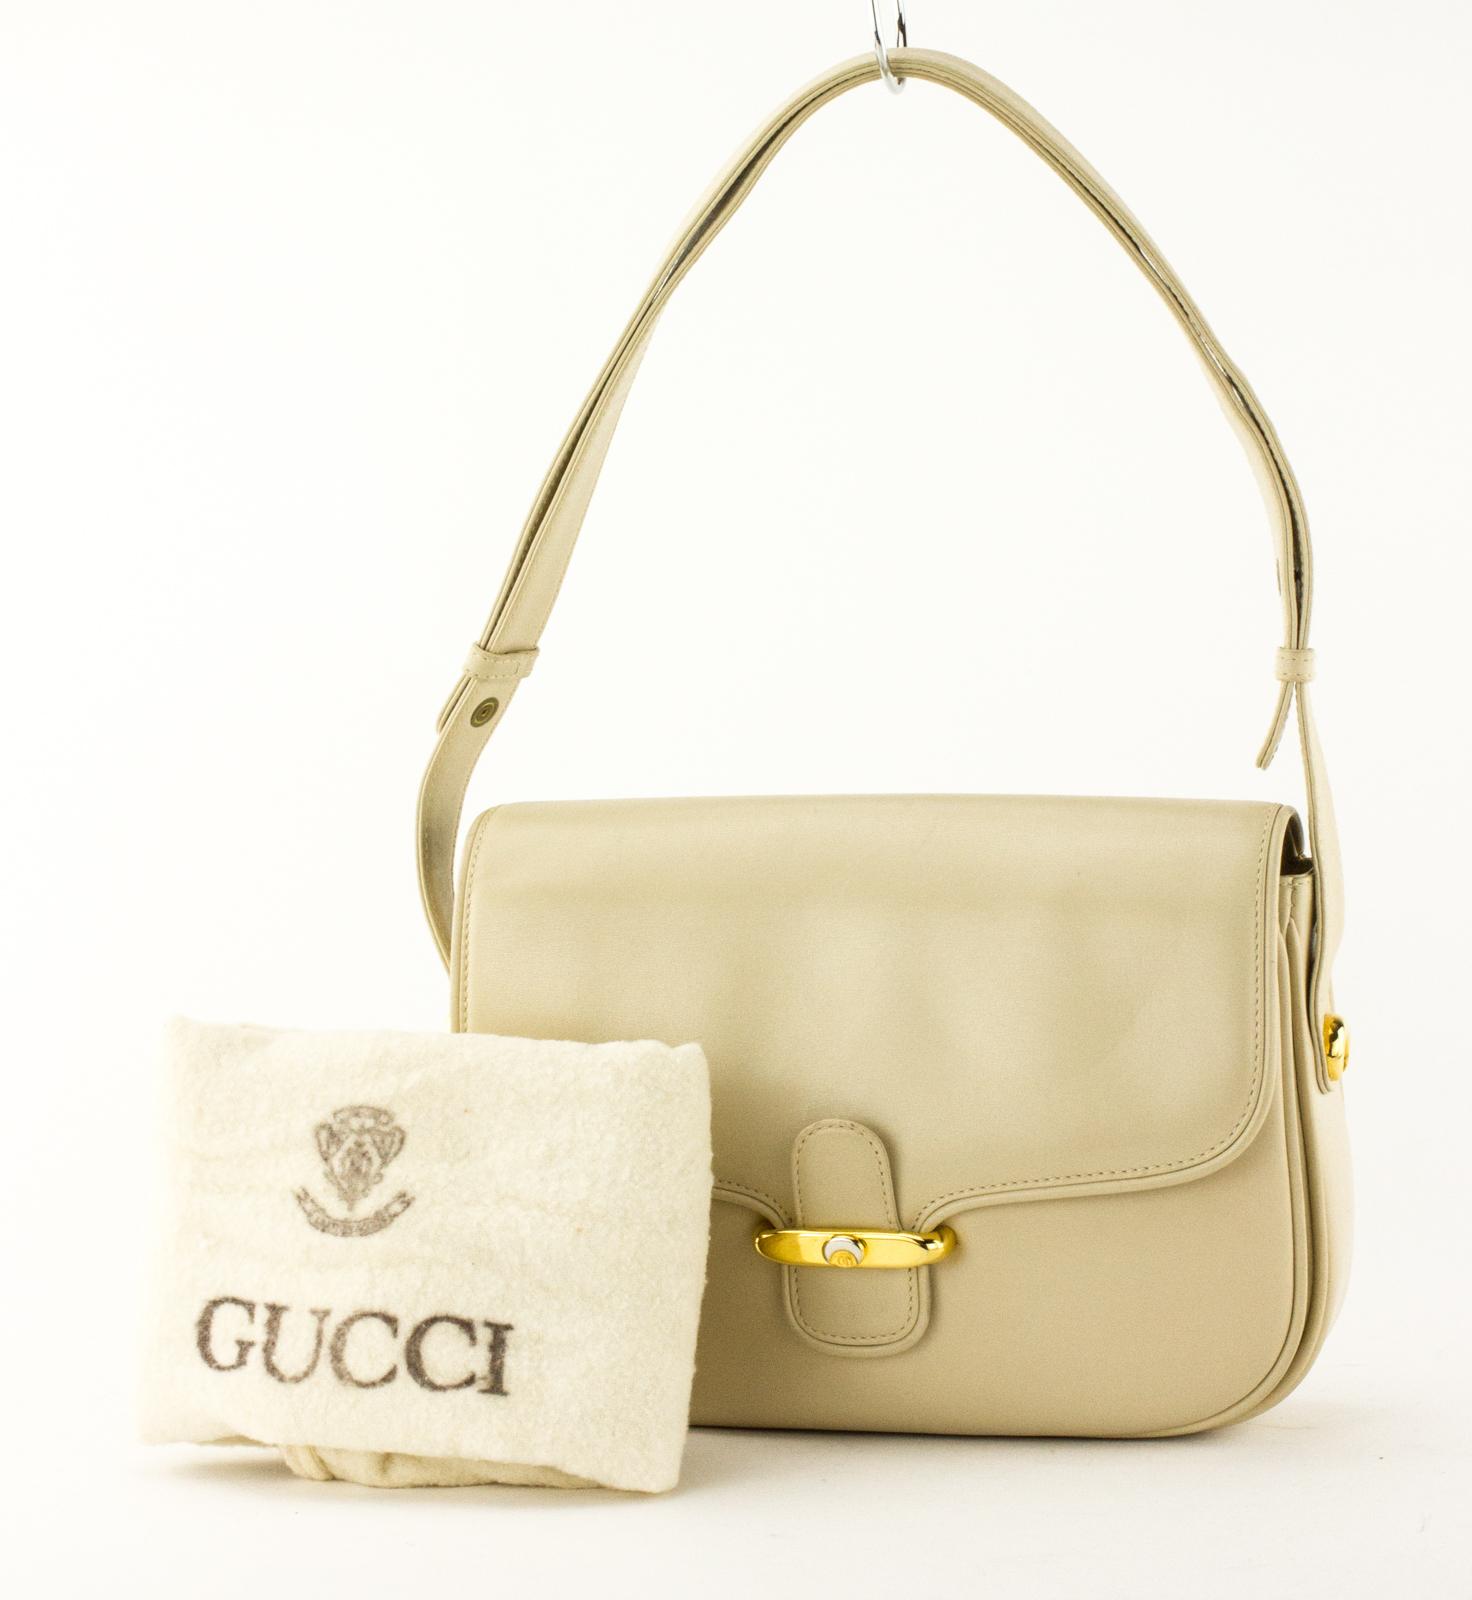 70ecfe1f5c15 Details about GUCCI Cream Vintage Leather Flap Shoulder Bag